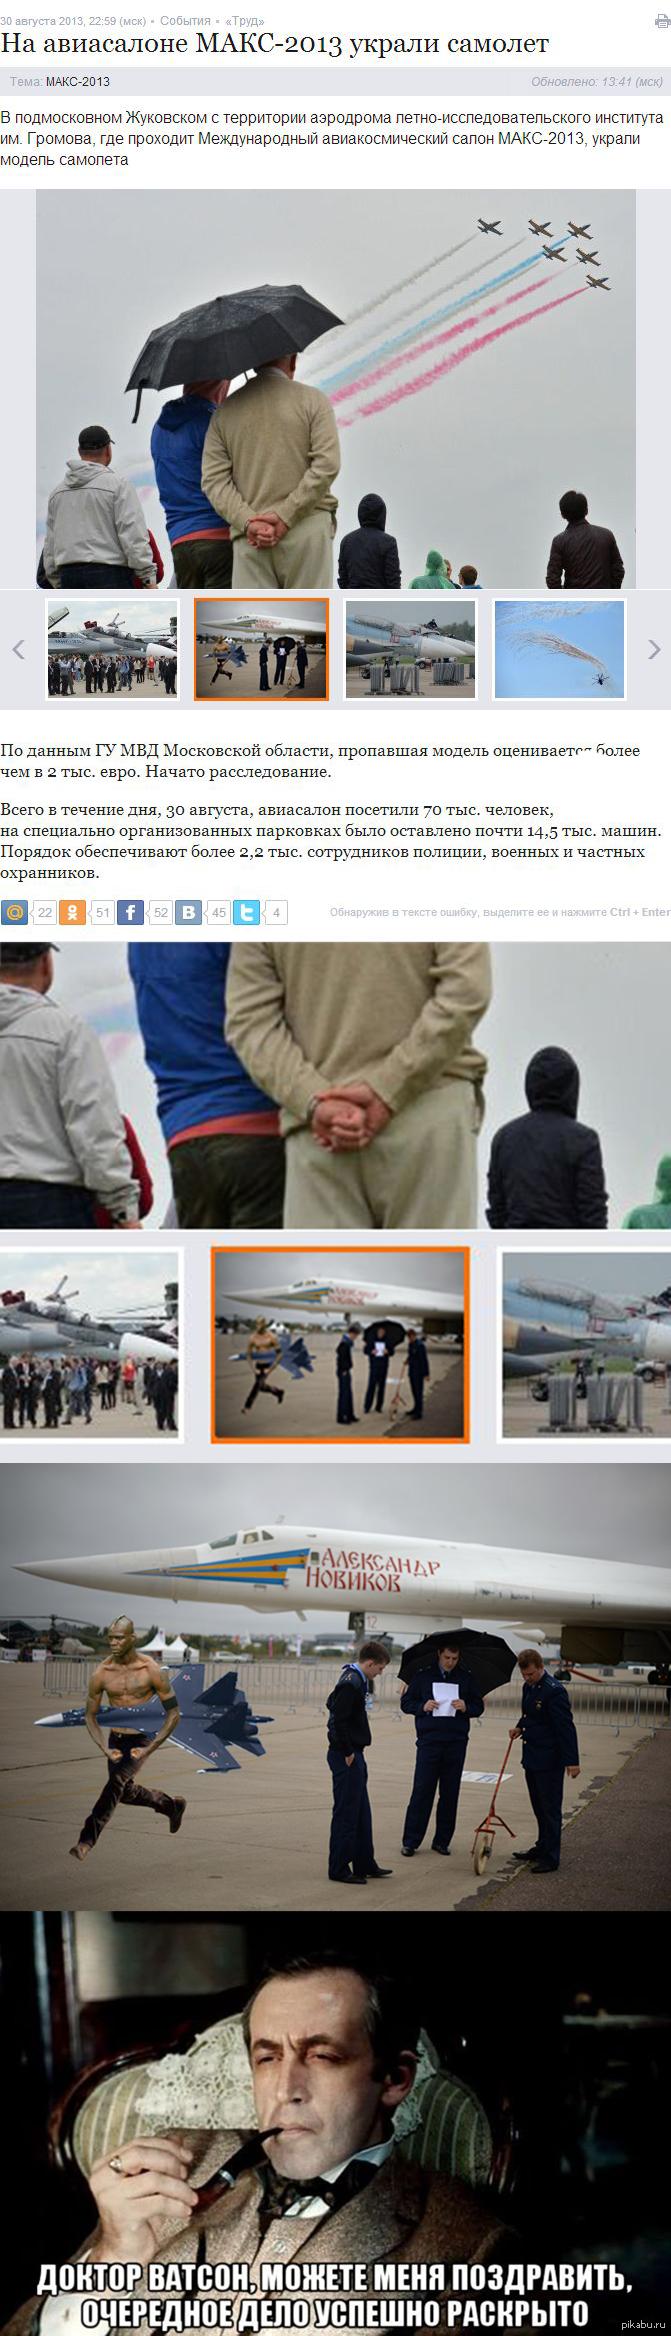 На авиасалоне МАКС-2013 украли самолет http://news.mail.ru/incident/14557340/?frommail=1